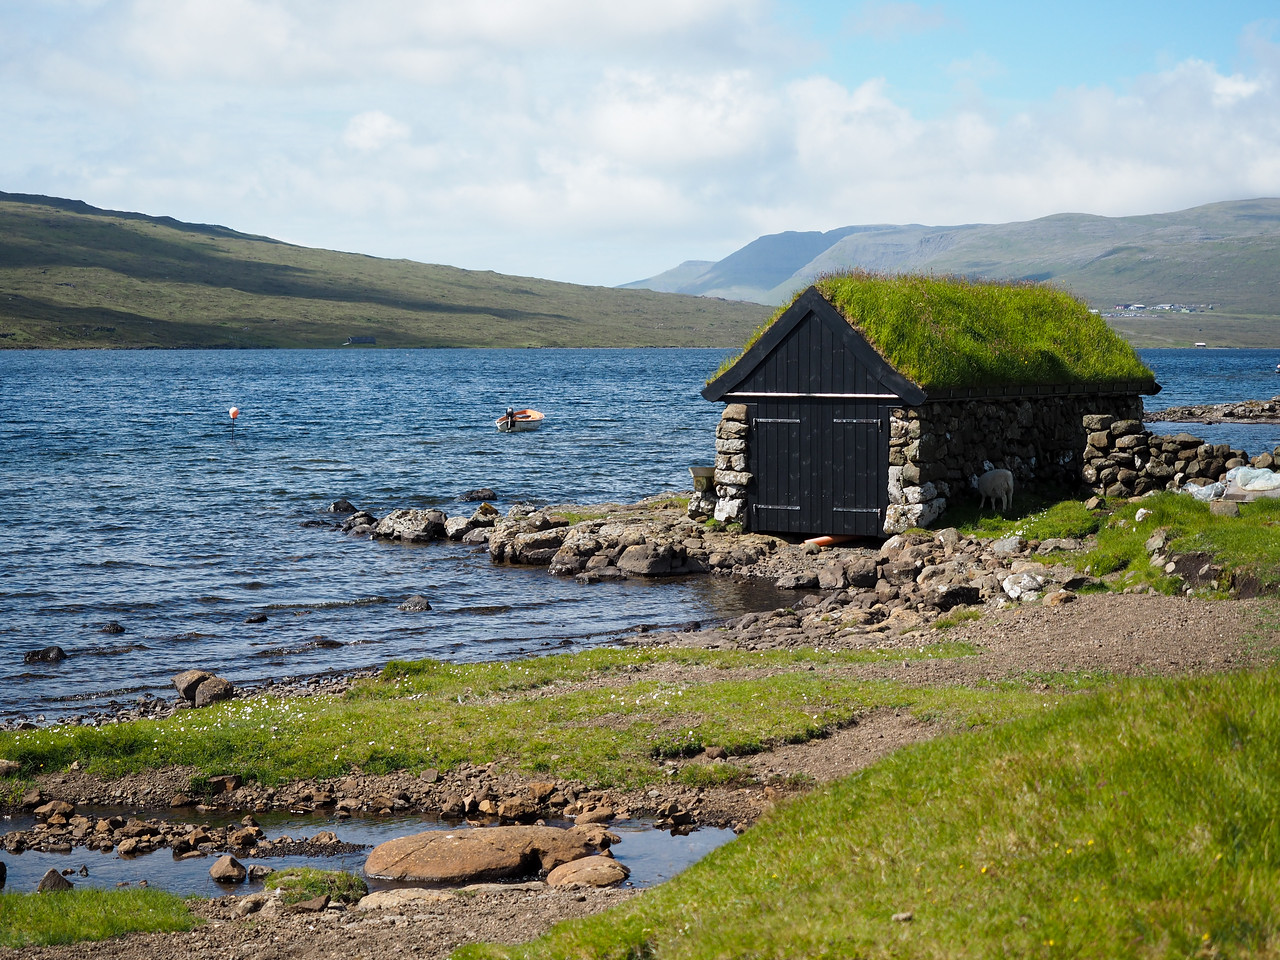 Sørvágsvatn, the largest lake in the Faroe Islands